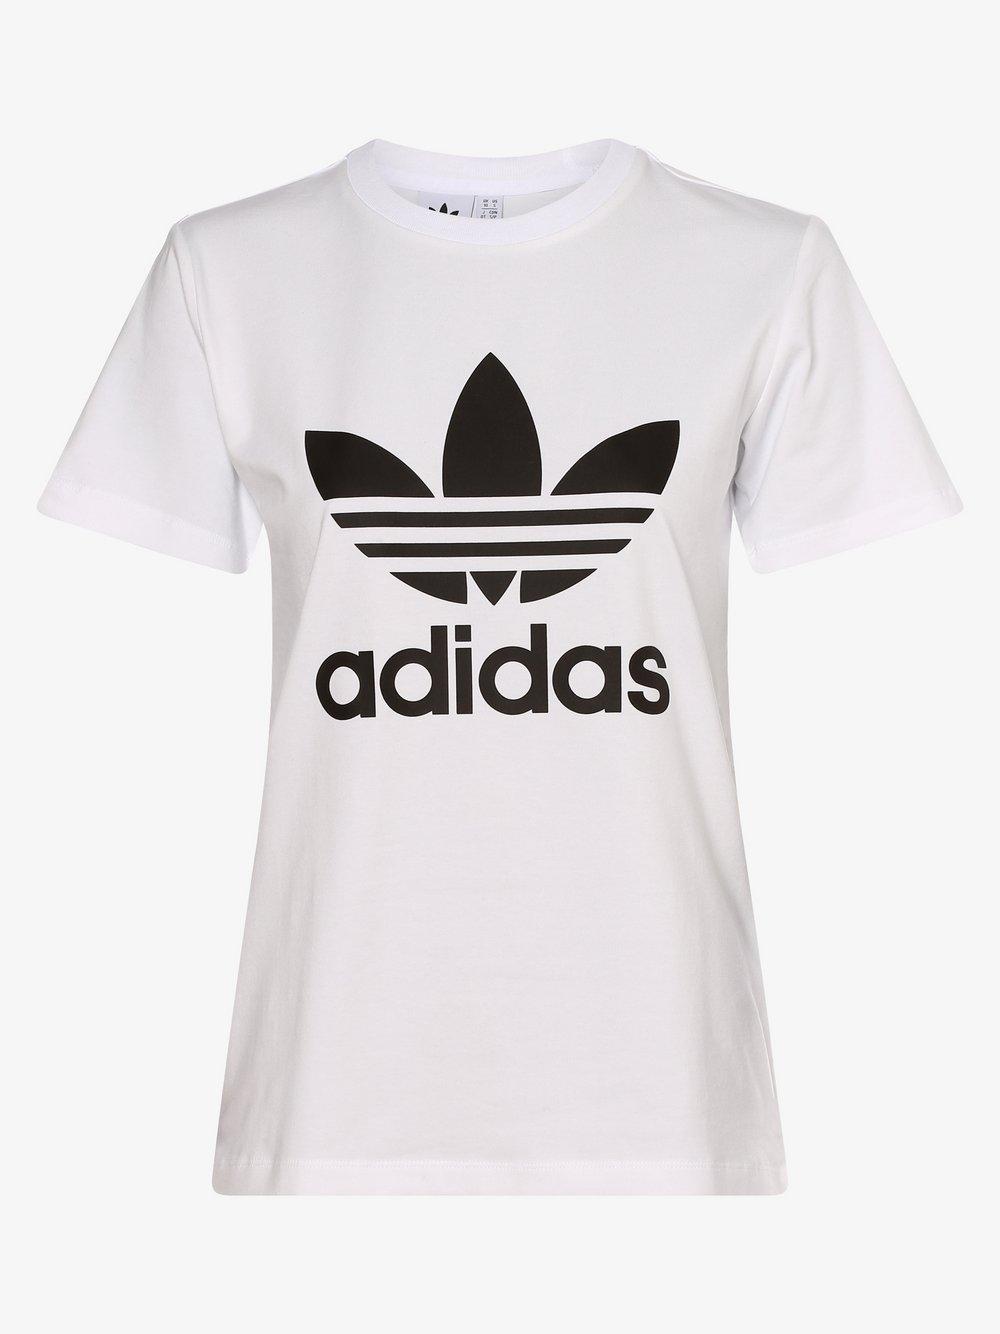 adidas Originals - T-shirt damski, biały